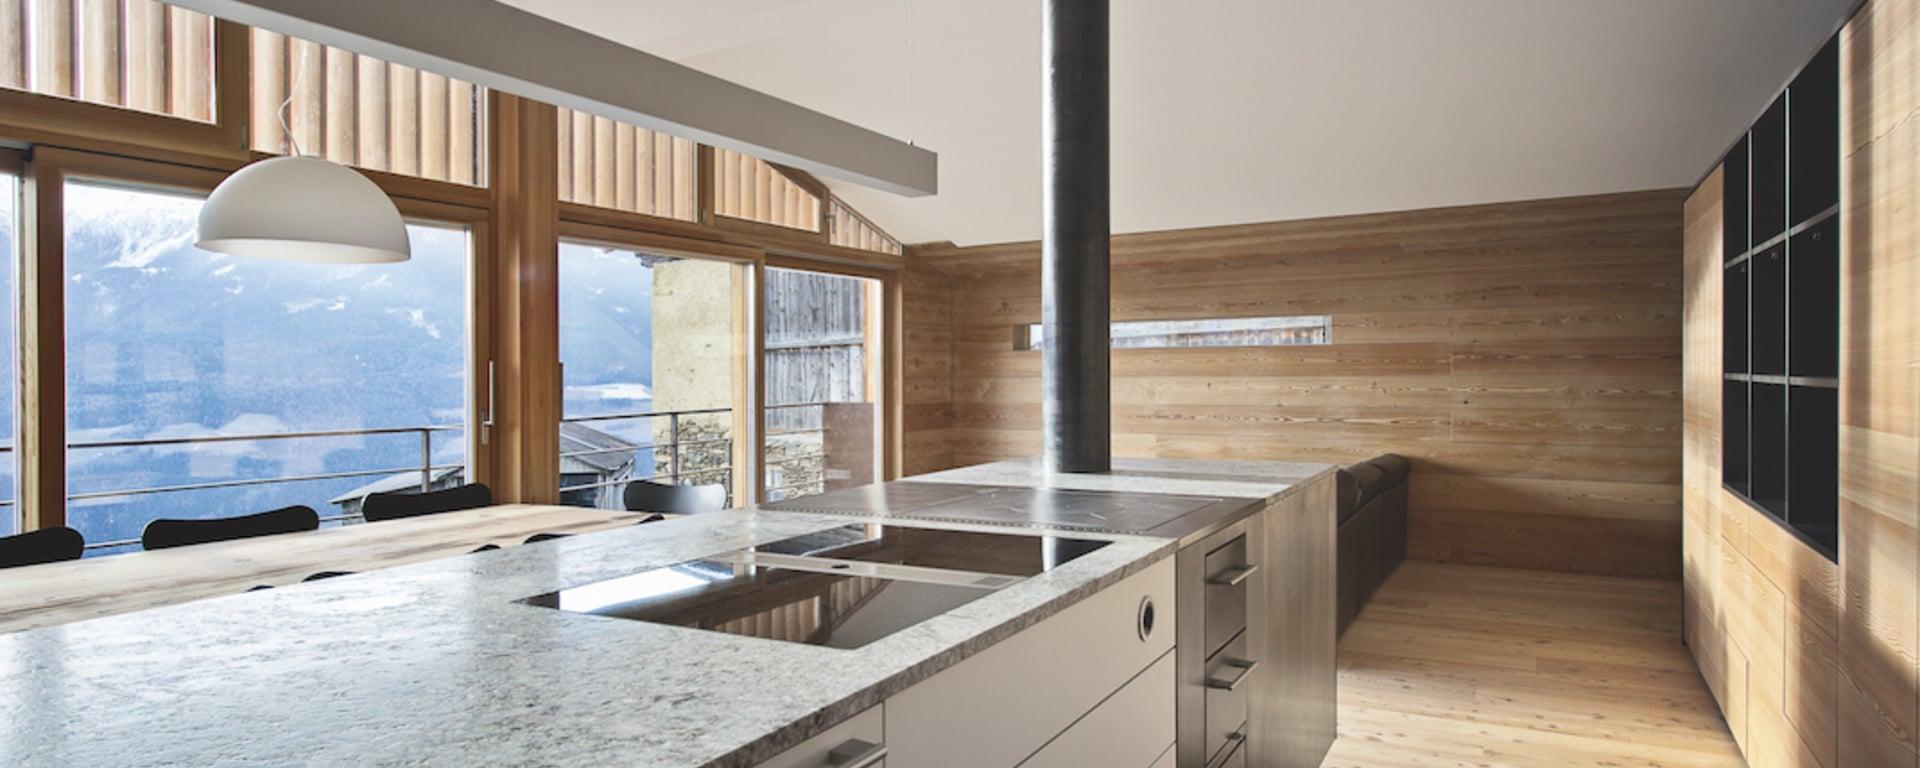 Su misura cucina economica a legna pertinger for Cucine pertinger